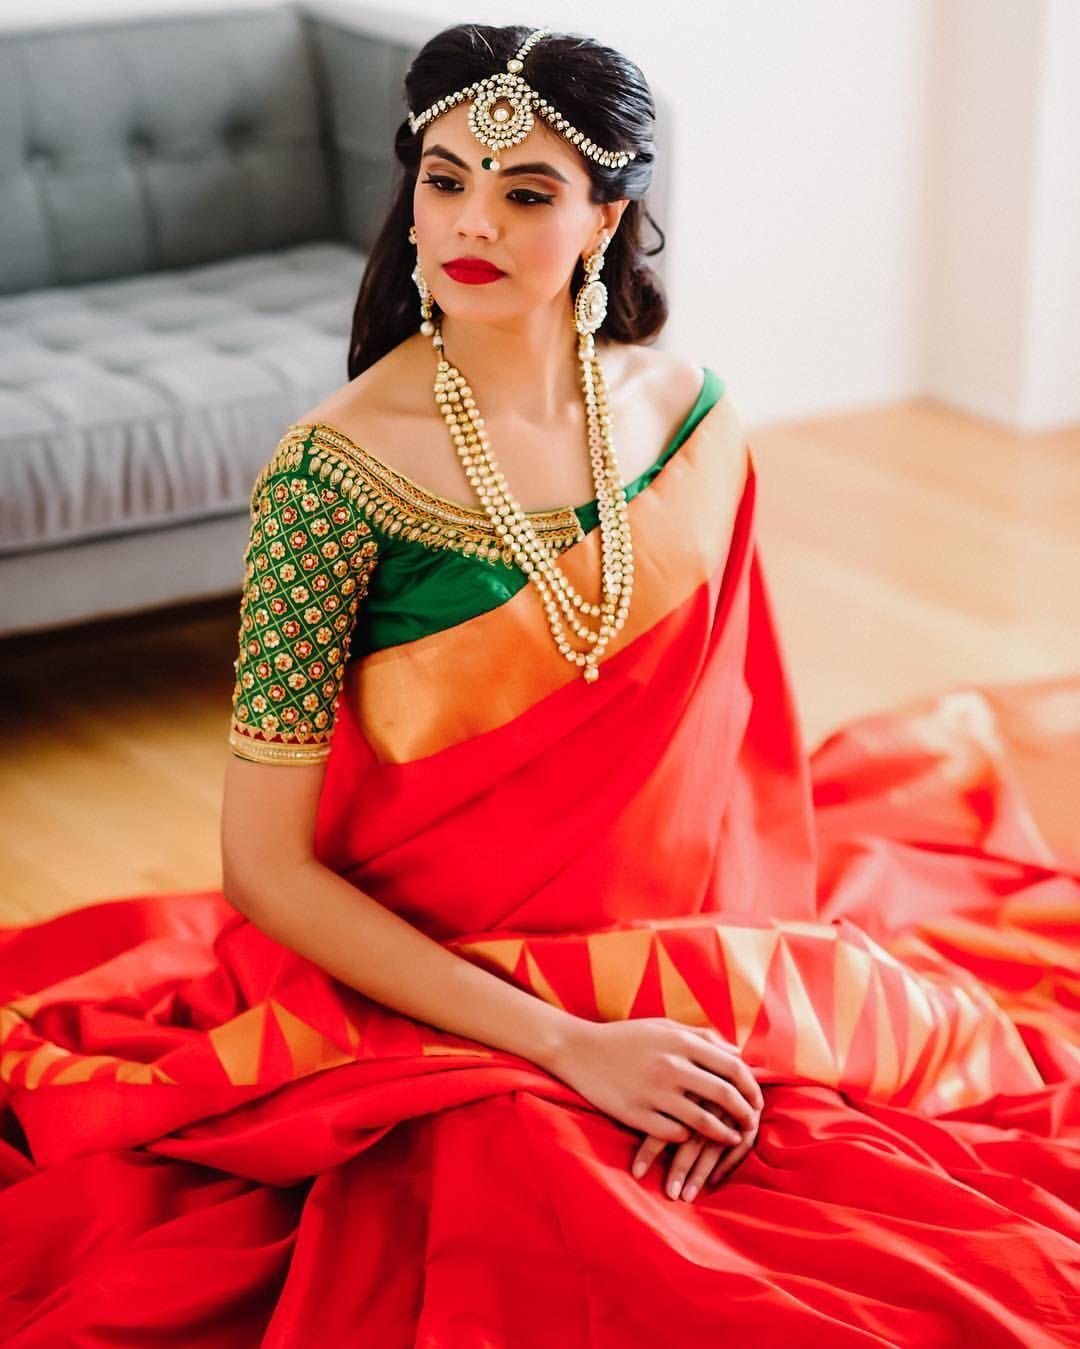 47b35351261c86 Red silk kanchipuram sari with contrast green blouse.Braid with fresh  jasmine flowers. Tamil bride. Telugu bride. Kannada bride. Hindu bride.